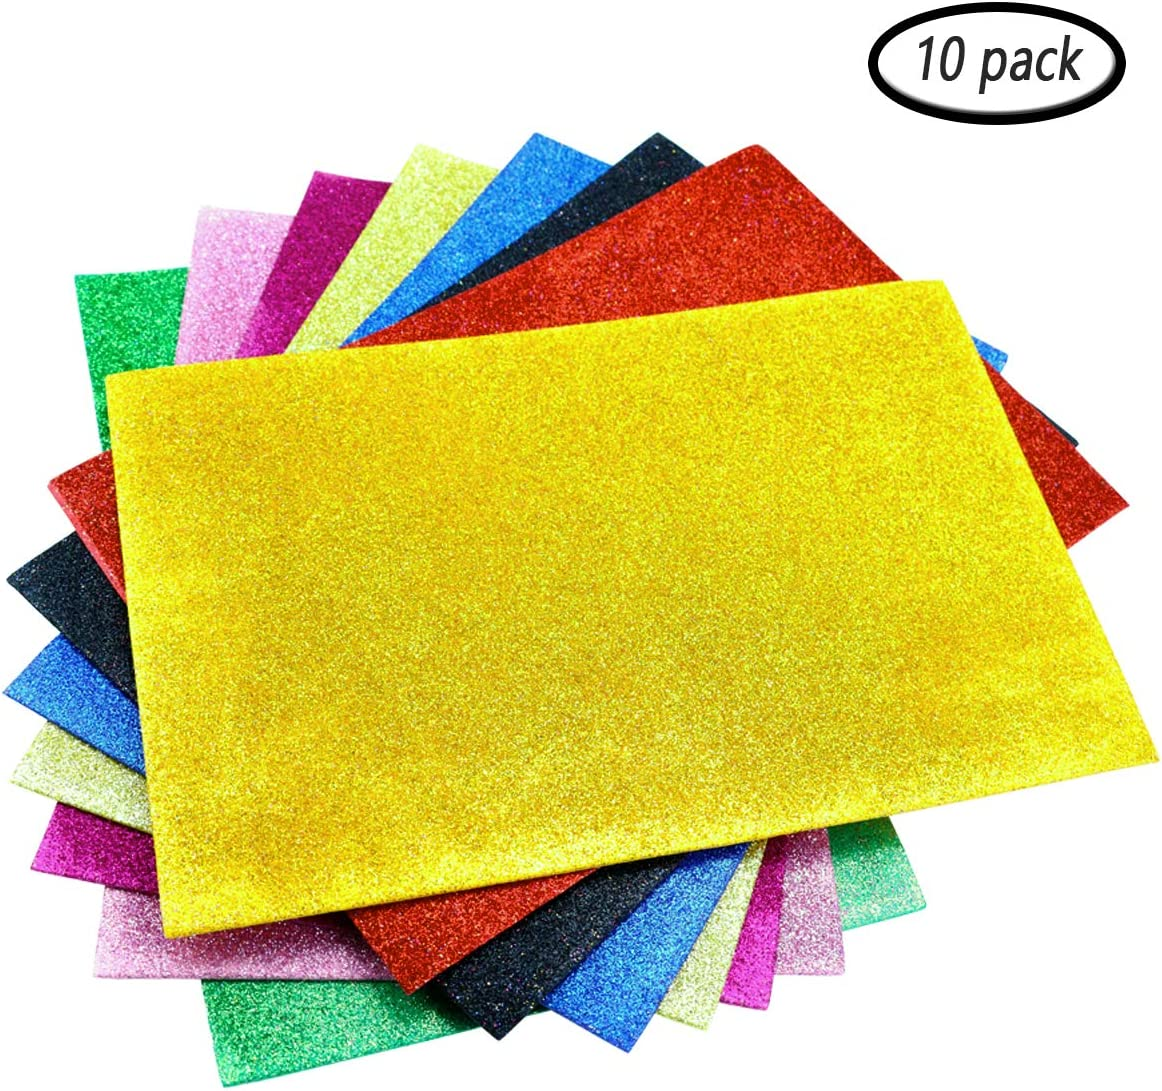 10 Colourful A4 Glitter Card Sheets Kids Arts /& Crafts Set Glittery Paper Pack.